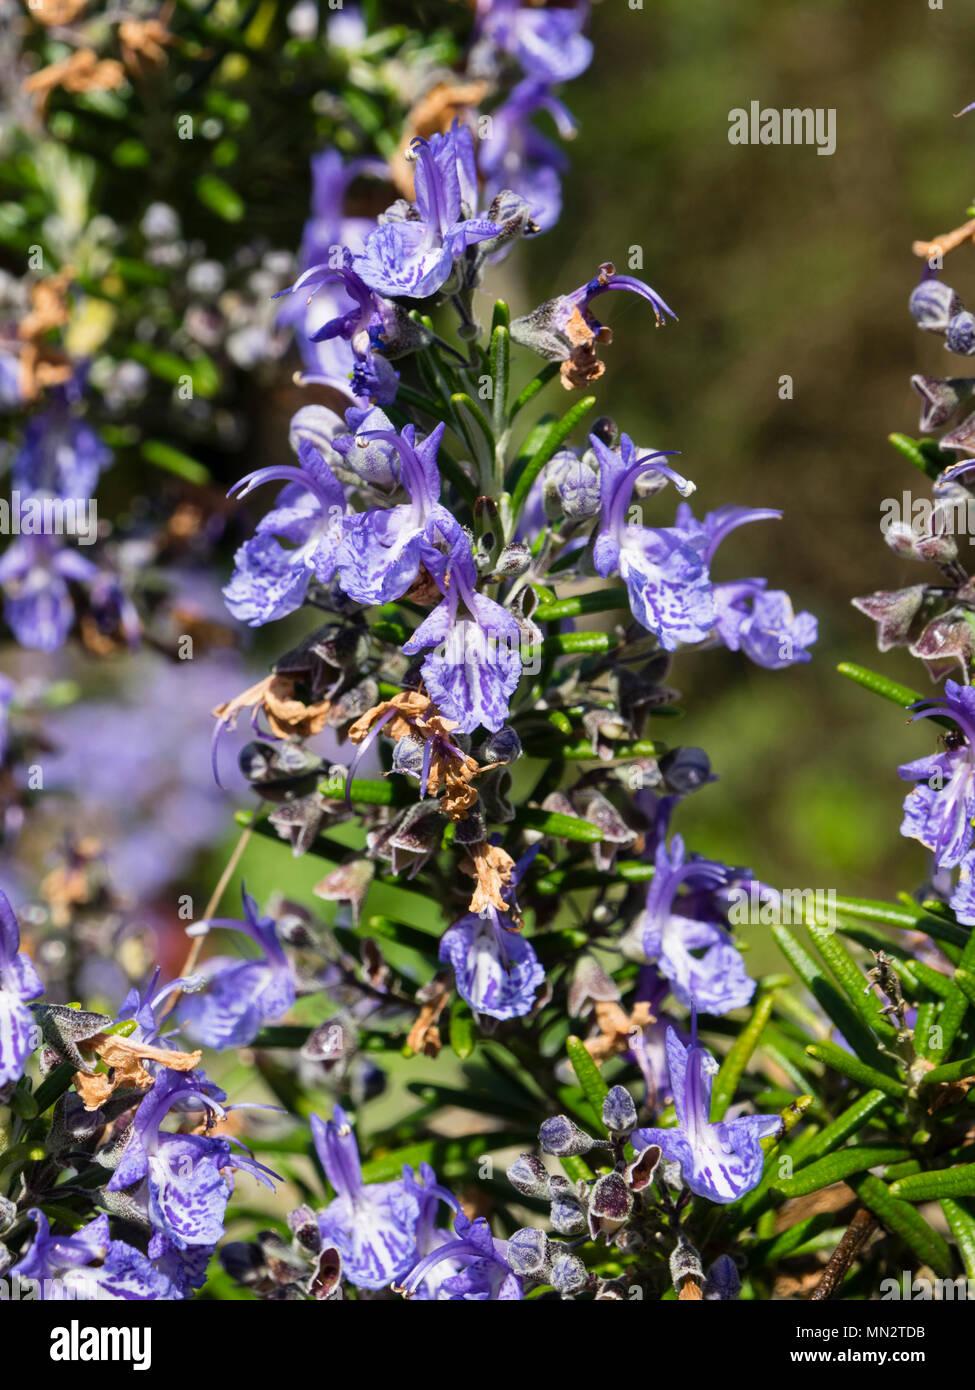 Dark blue flowers of the culinery herb rosemary variety, Rosmarinus officinalis 'Severn Sea' - Stock Image